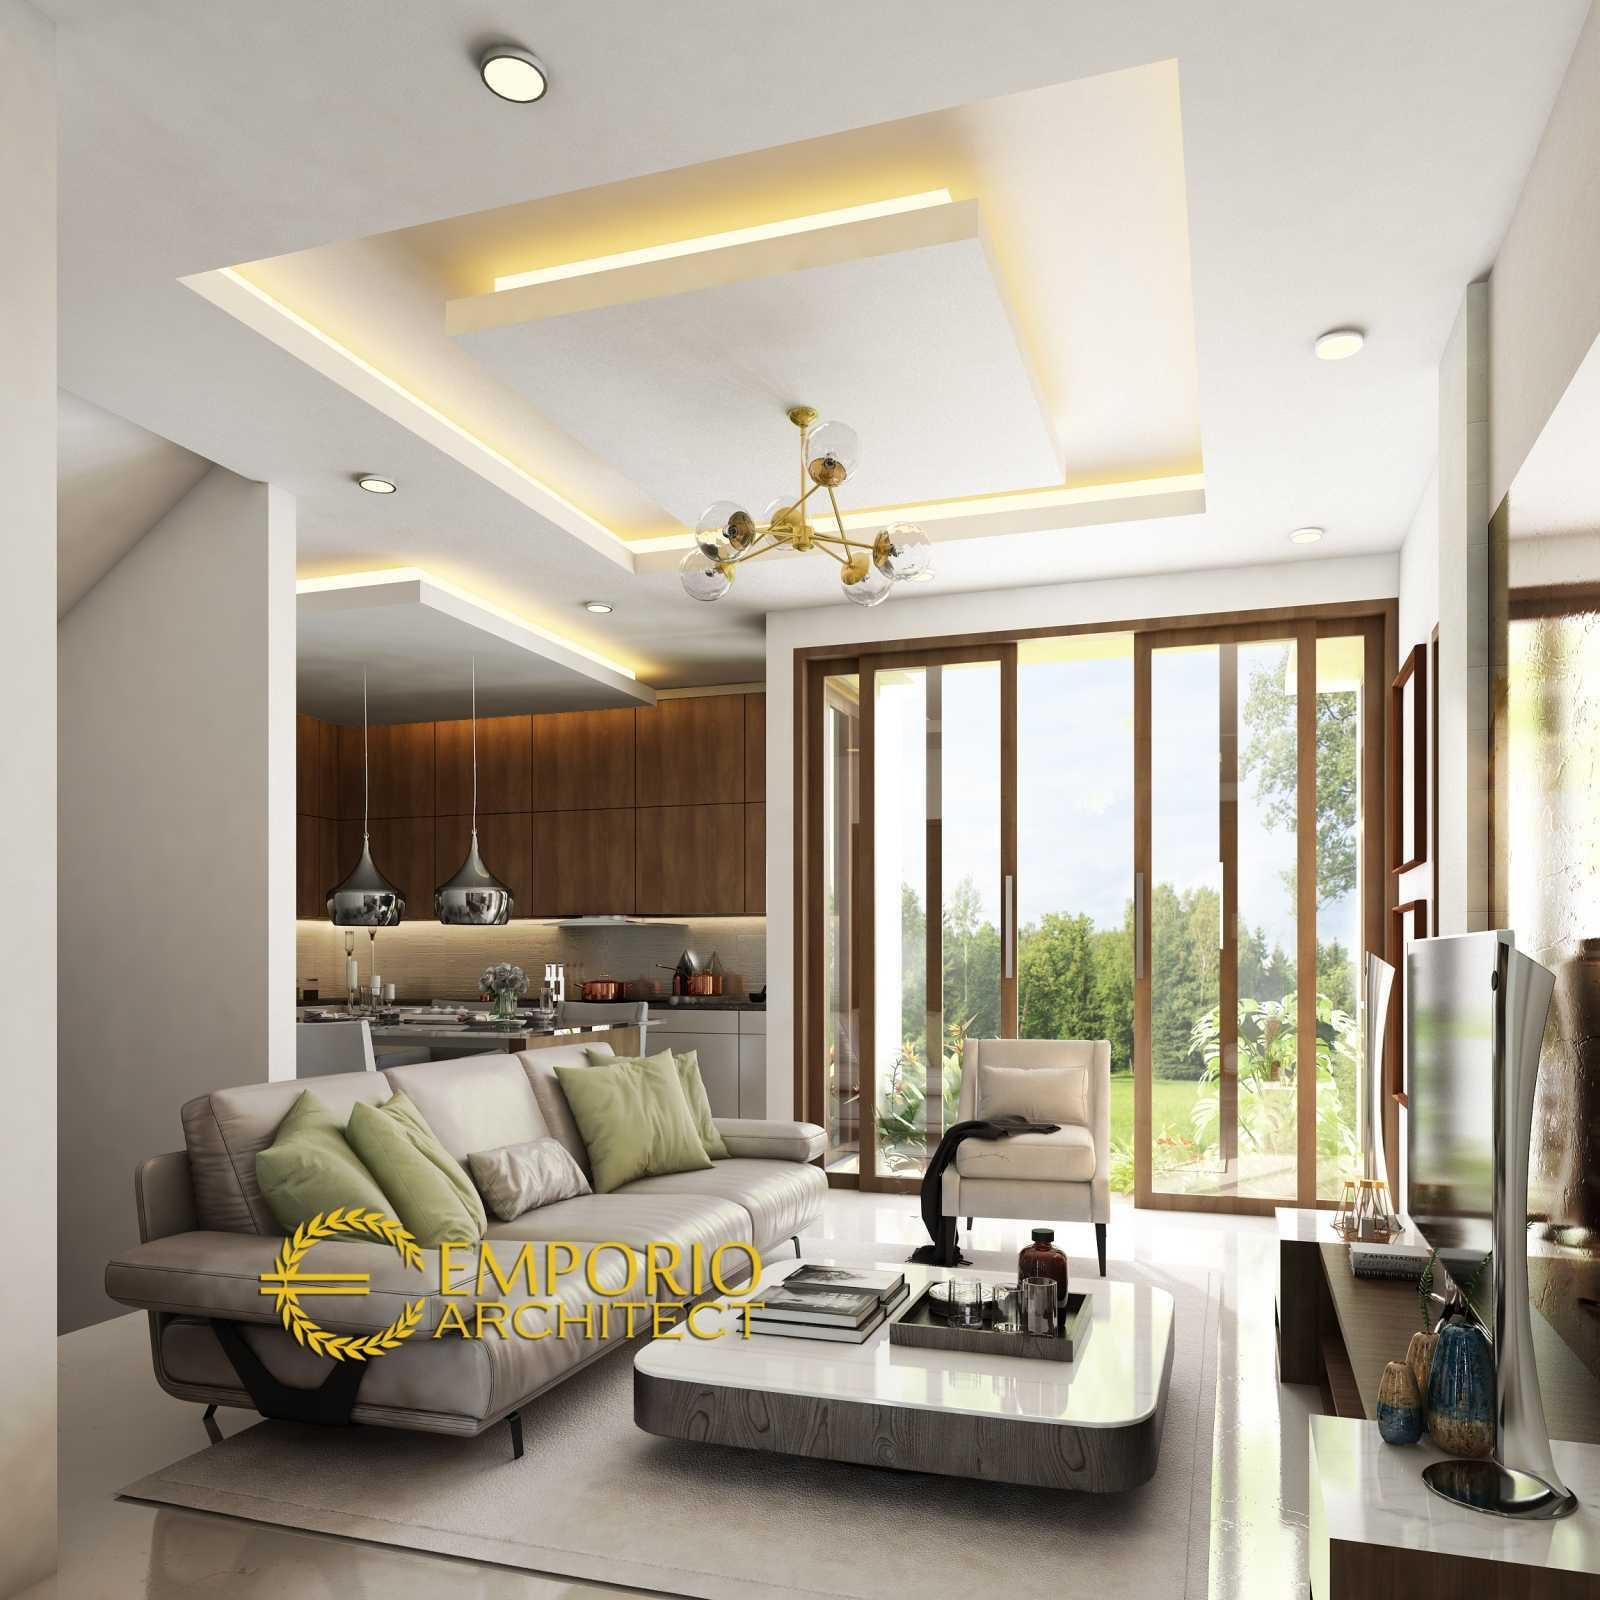 Emporio Architect Desain Rumah Villa Bali Tropis 573 @ Bogor Bogor, Jawa Barat, Indonesia Bogor, Jawa Barat, Indonesia Emporio-Architect-Desain-Rumah-Villa-Bali-Tropis-573-Bogor   74222